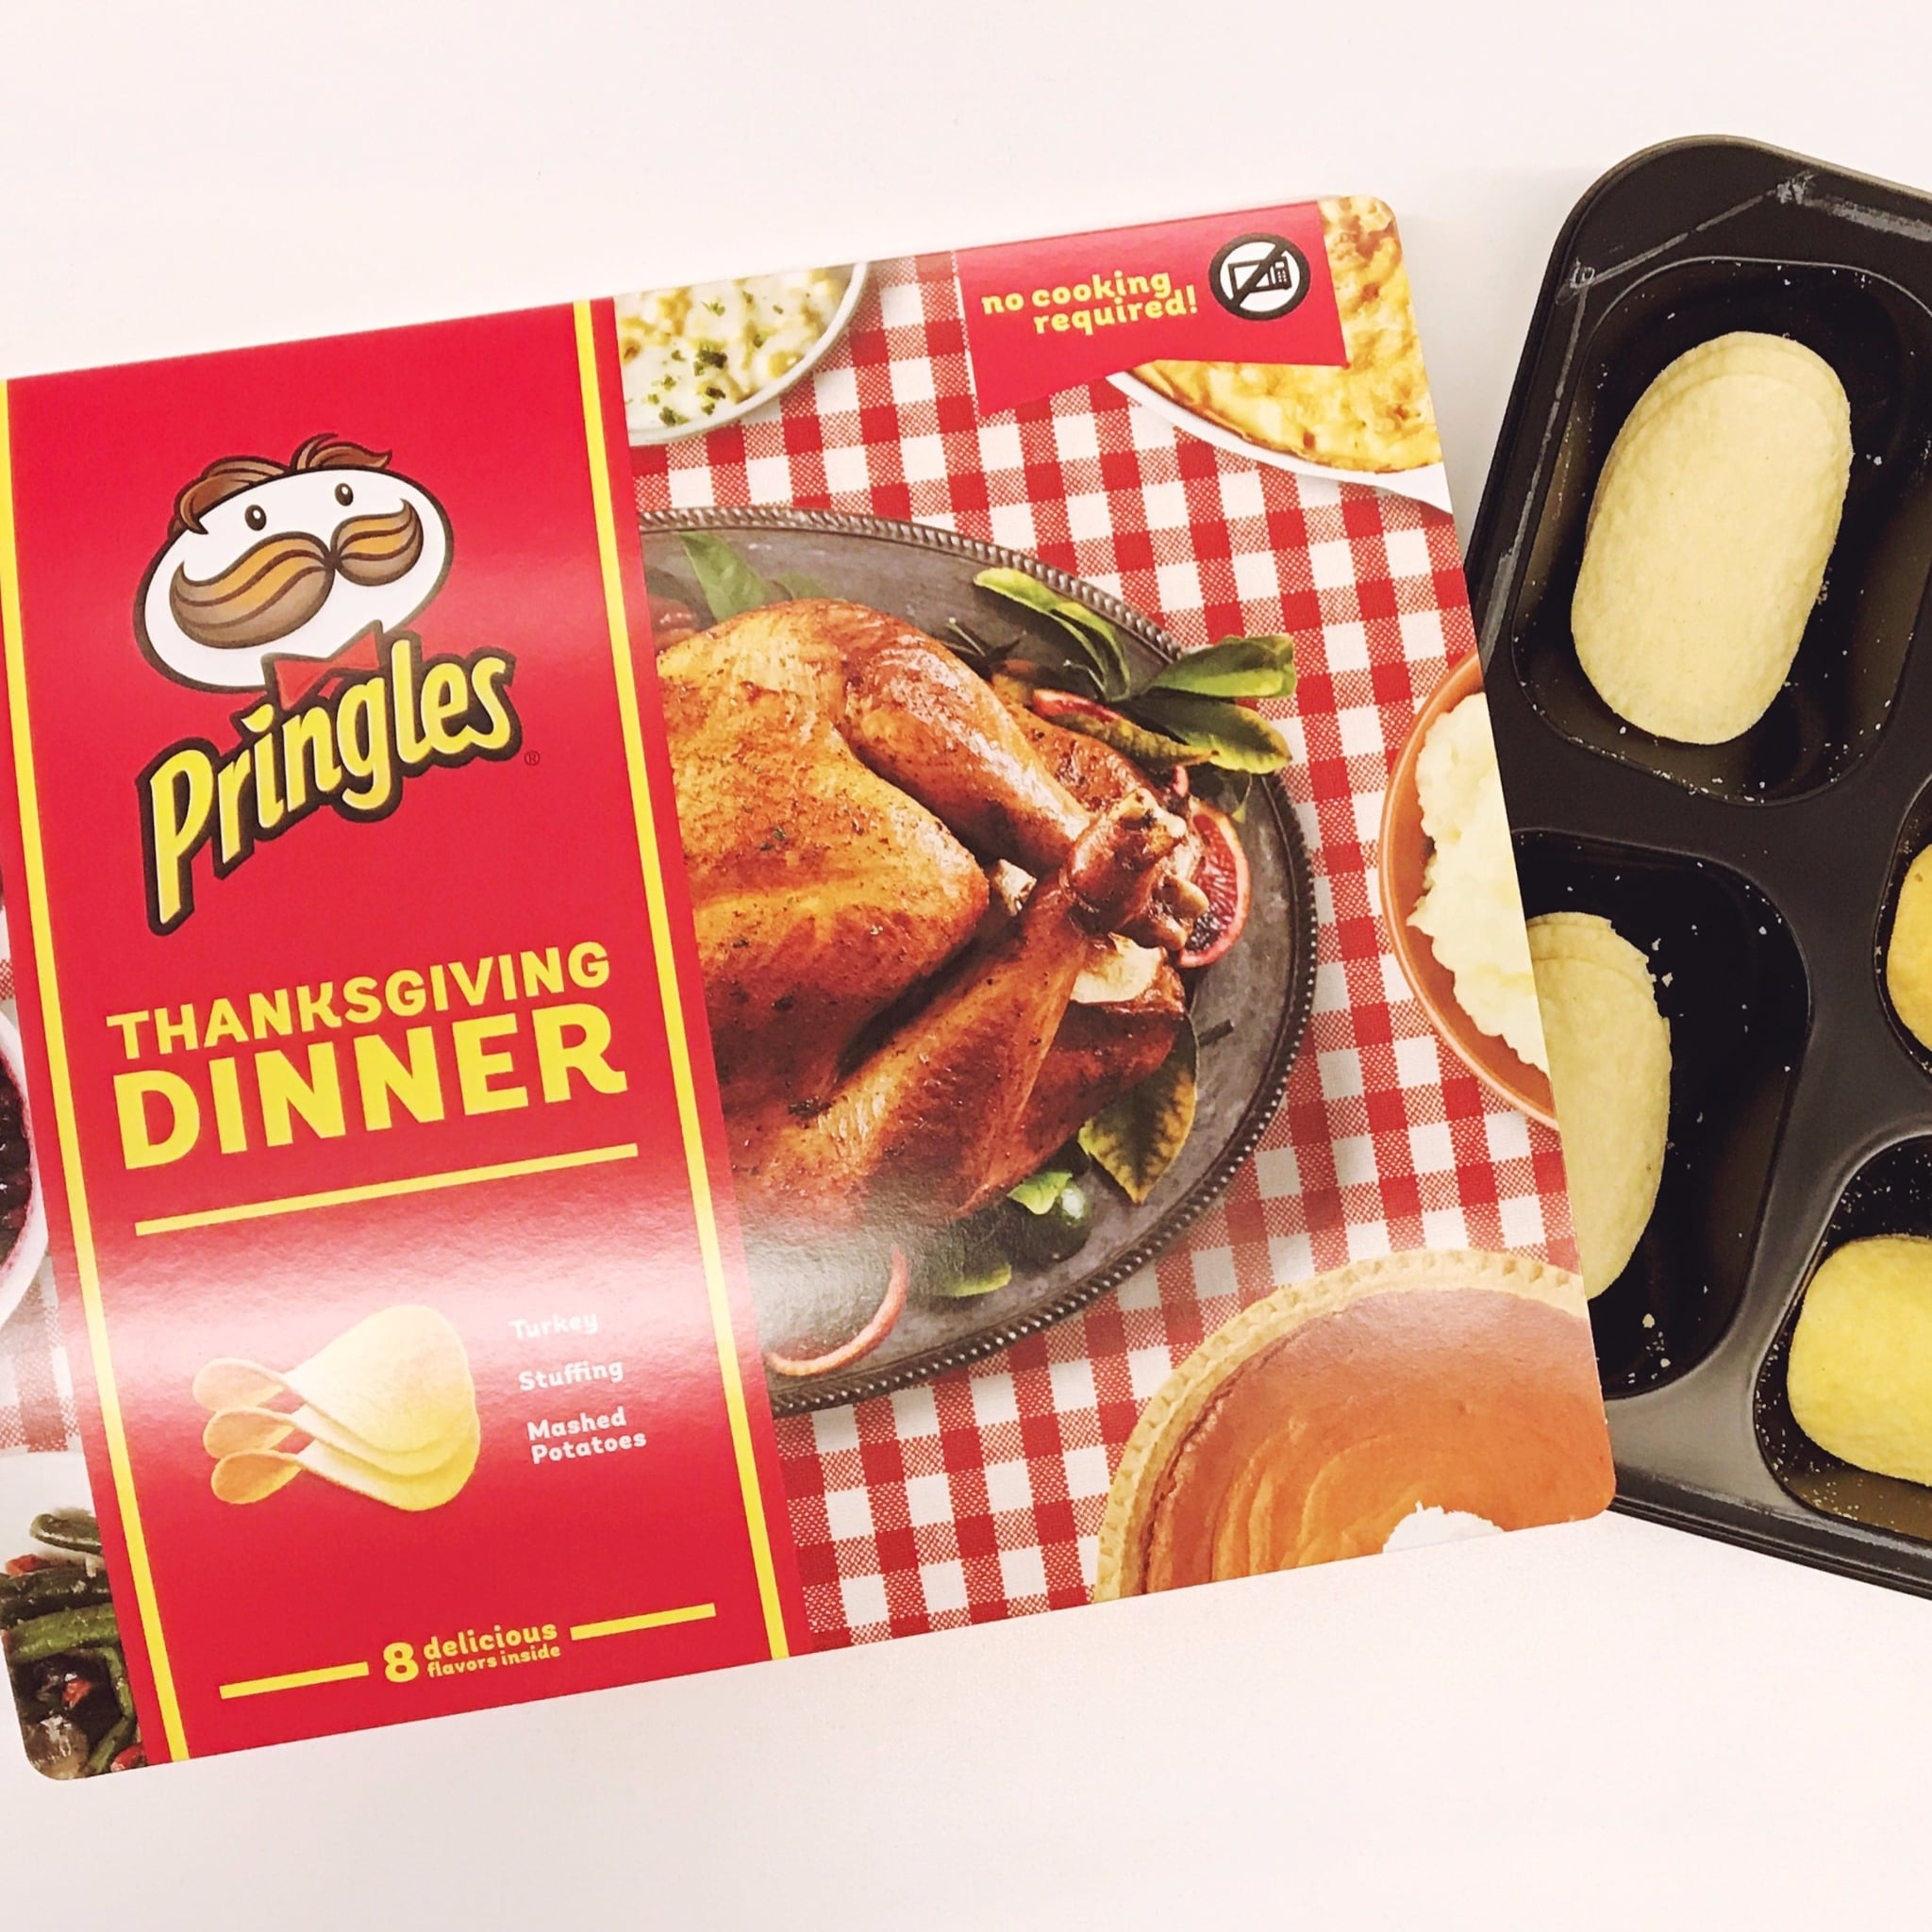 Thanksgiving Dinner Pringle Flavors Review   POPSUGAR Food